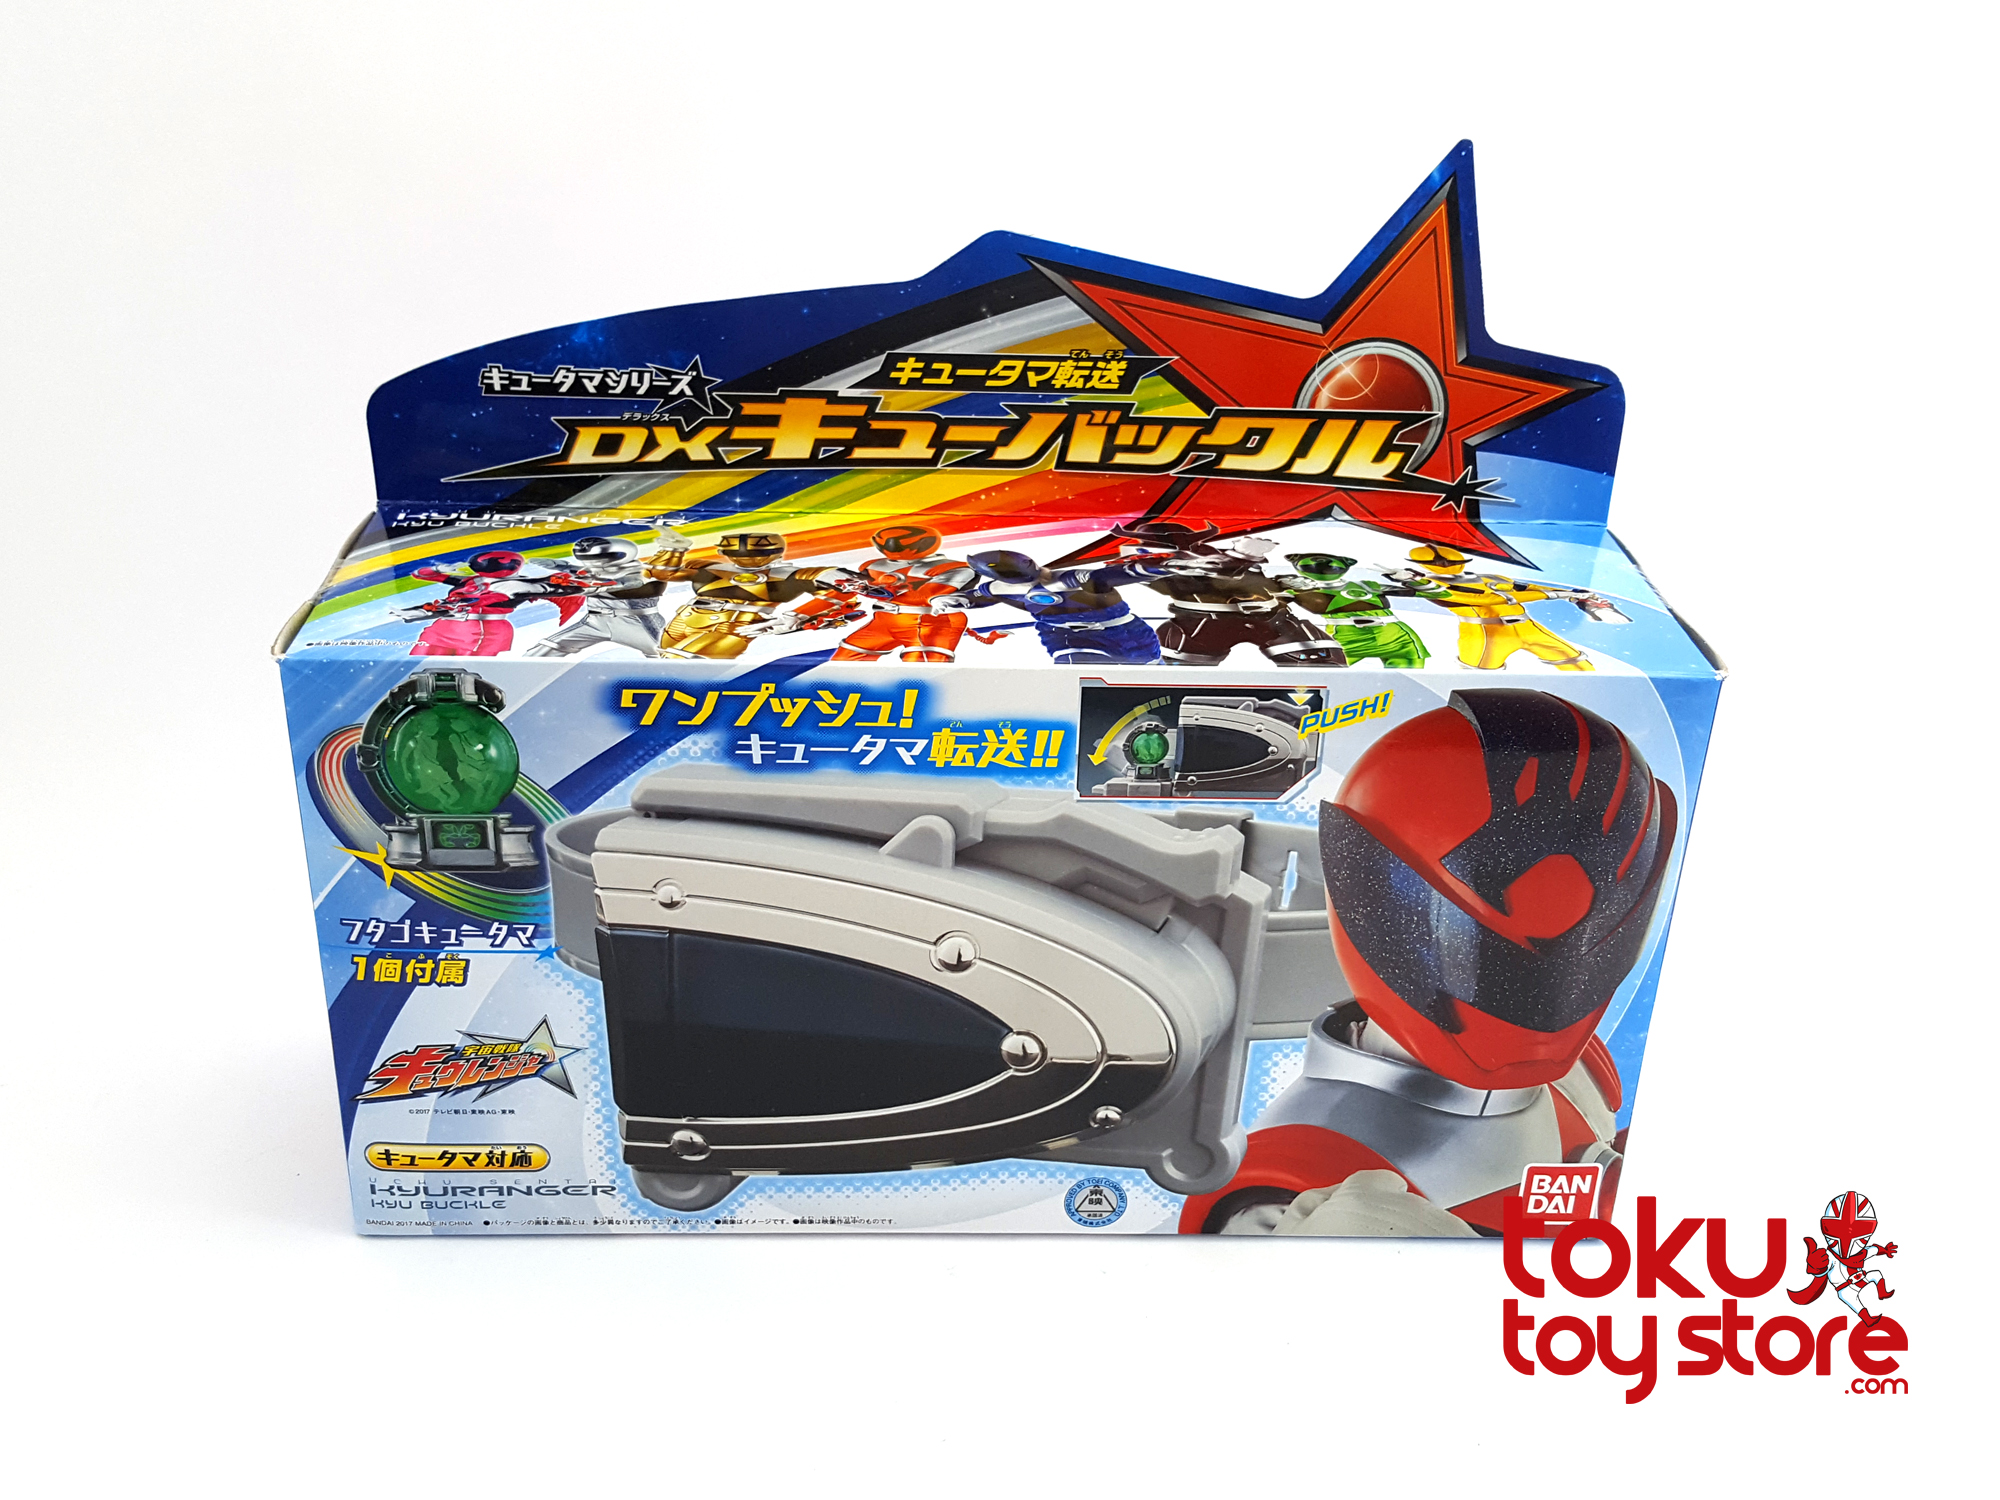 Bandai Uchu Sentai Kyuranger DX Kyu Buckle